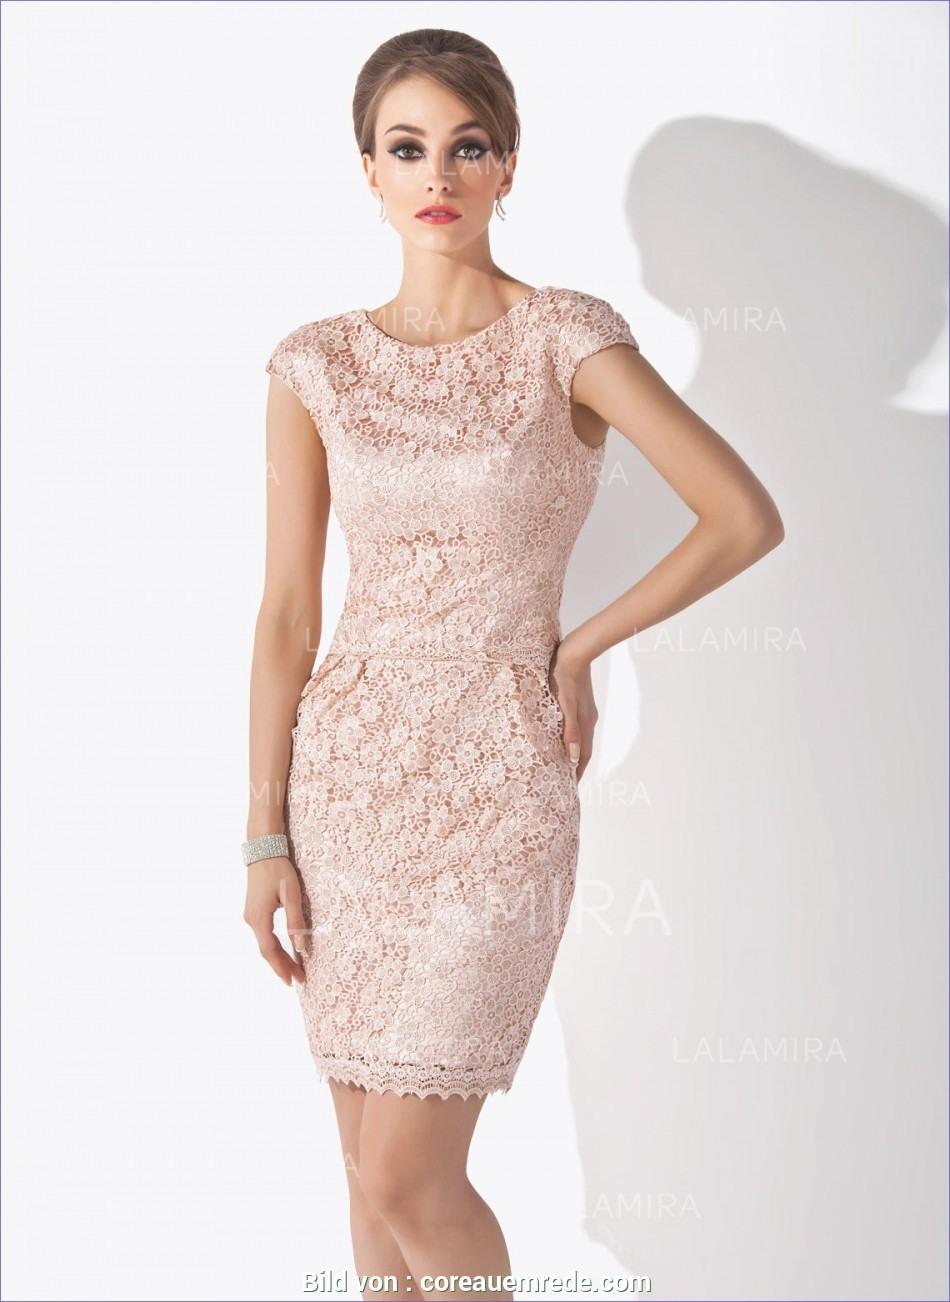 Formal Genial Besondere Abendkleider Spezialgebiet15 Schön Besondere Abendkleider Boutique